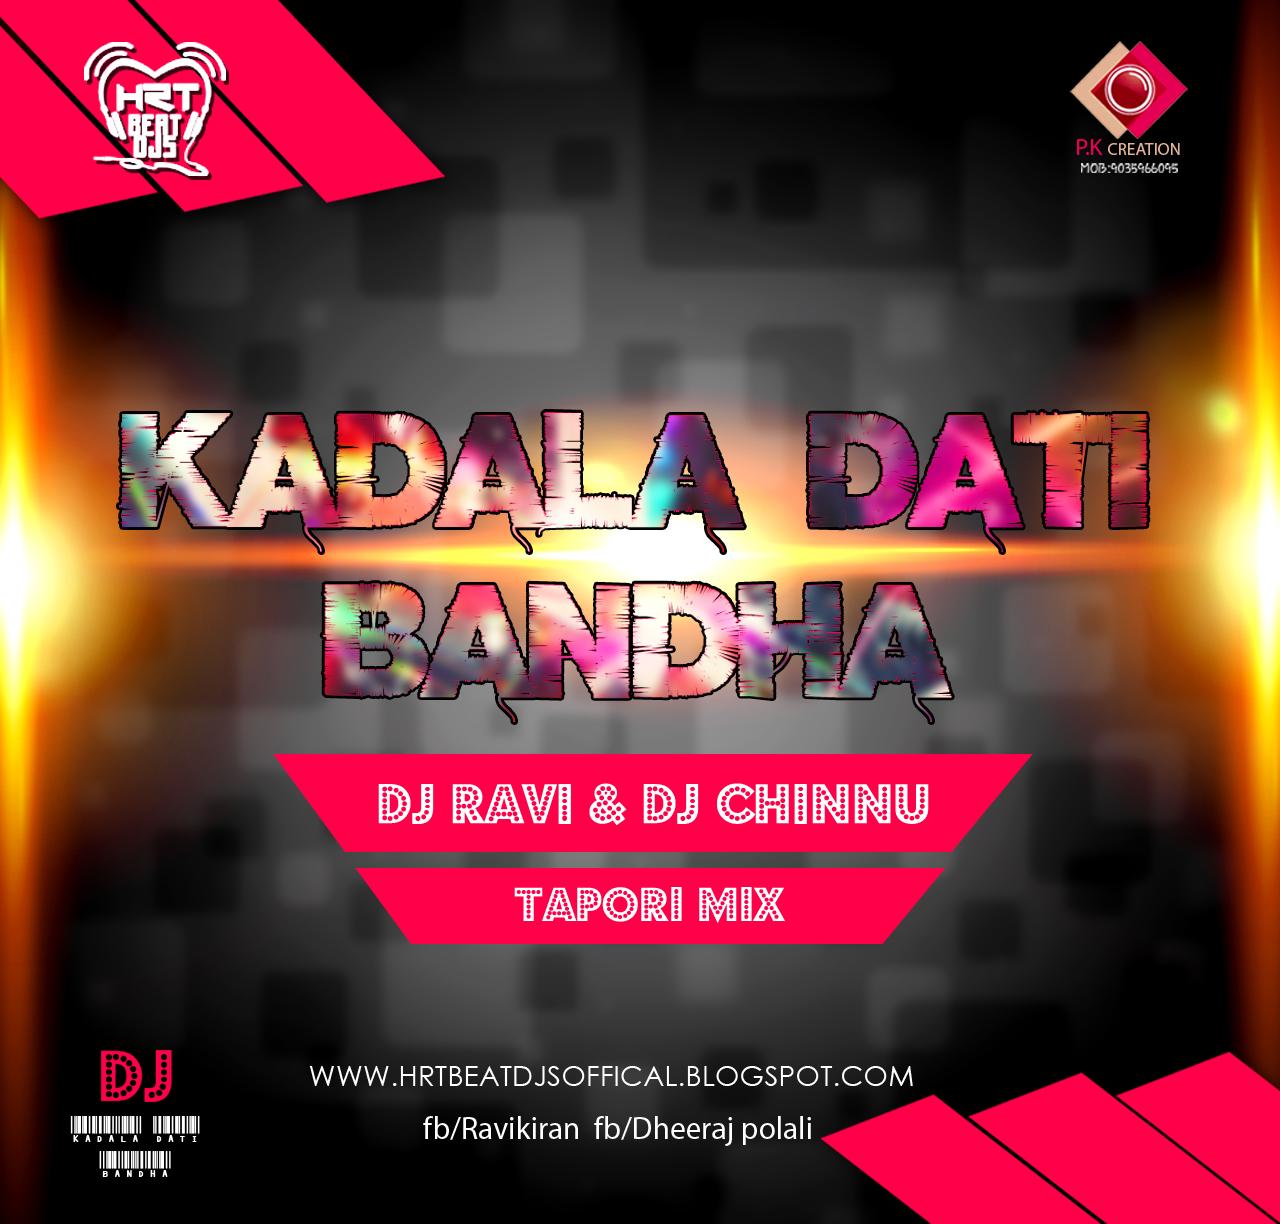 HRT BEAT DJ'S: KADALA DATI BANDHA | TAPORI MIX | DJ RAVI & DJ CHINNU